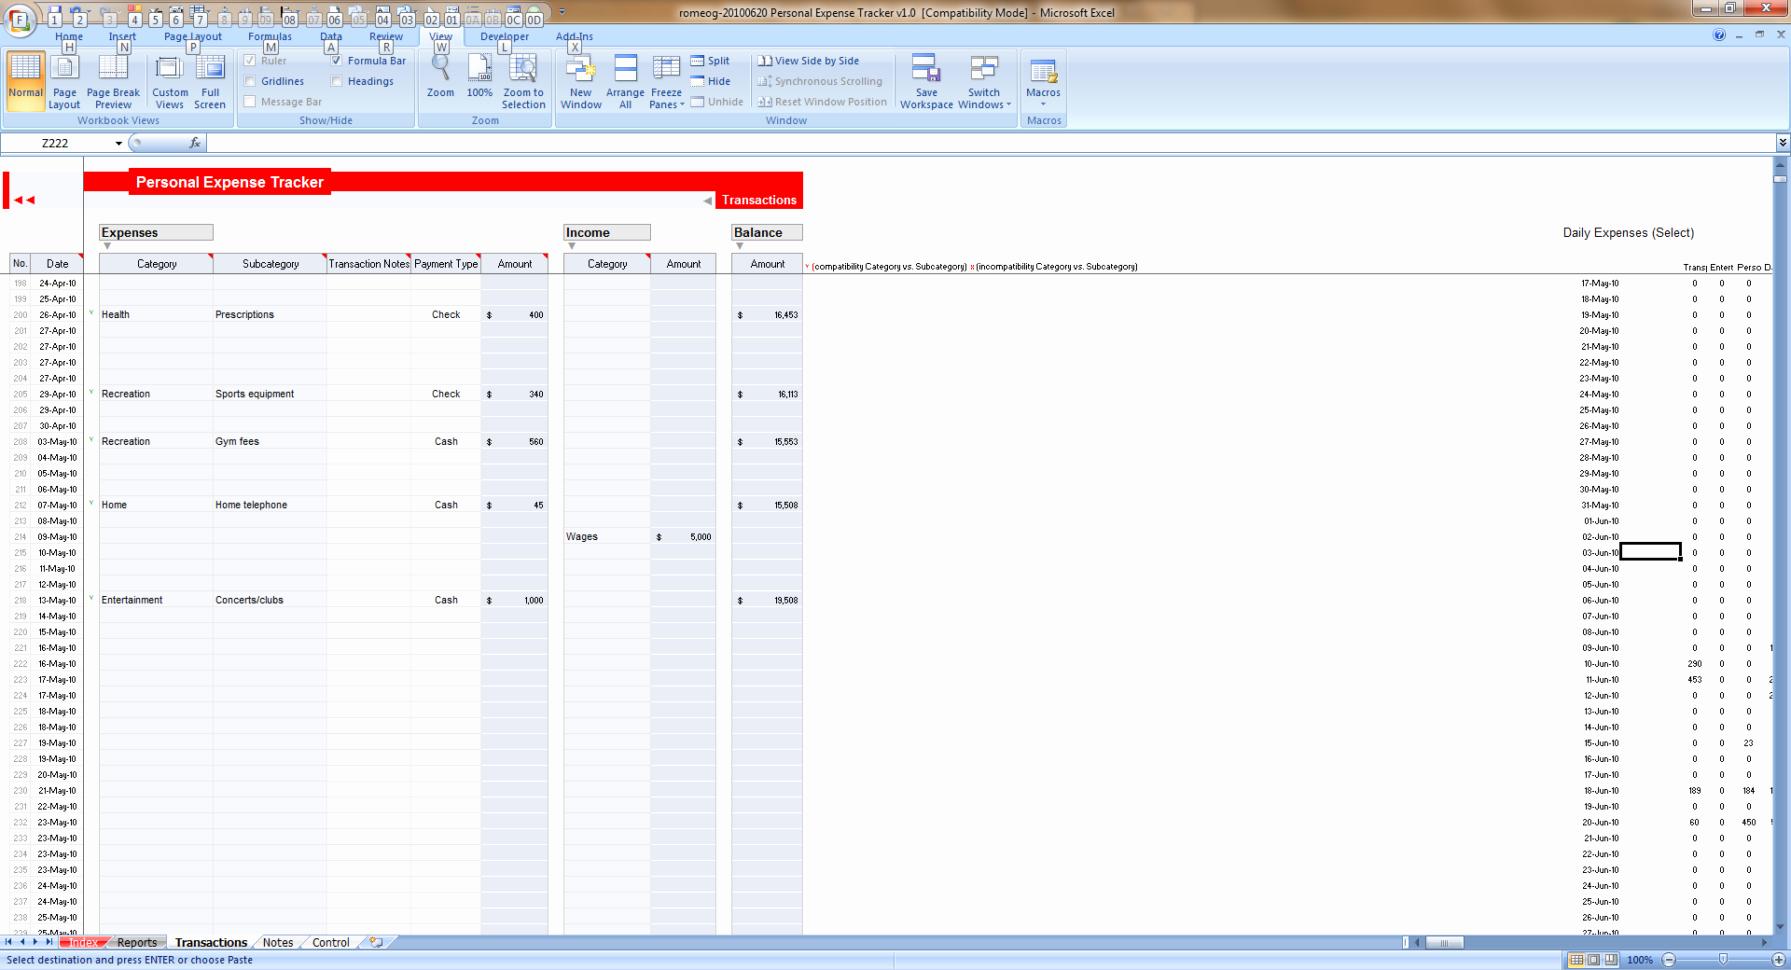 Excel Expense Tracker Template Elegant Expense Tracking Spreadsheet Template Expense Spreadsheet